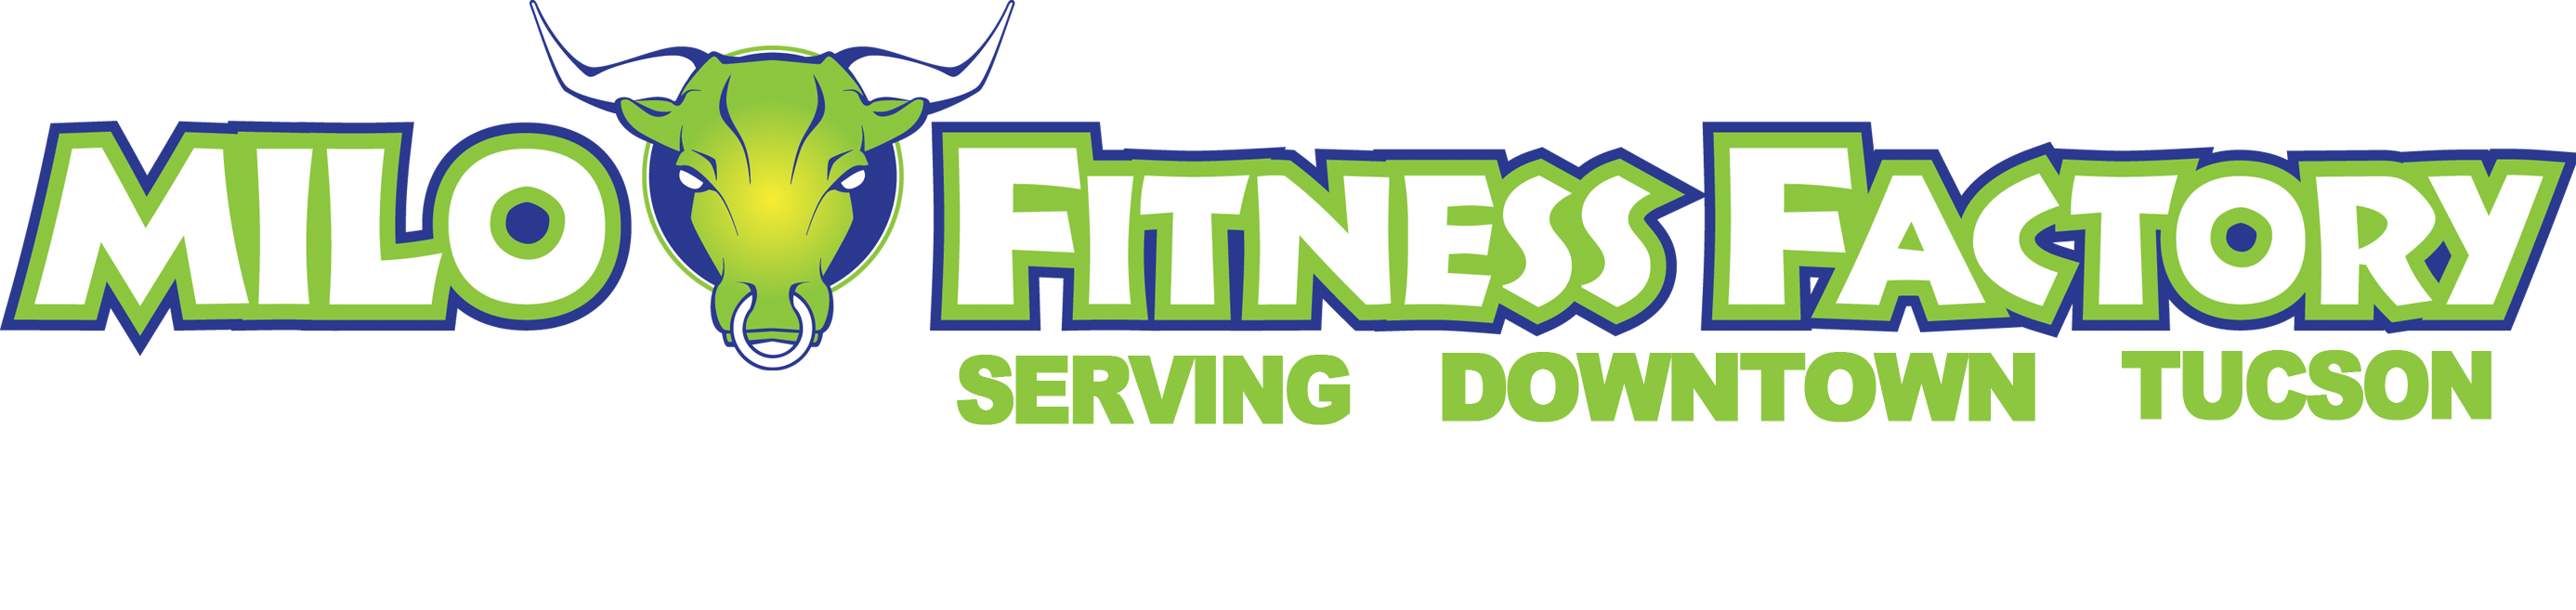 Milo Fitness Factory Logo